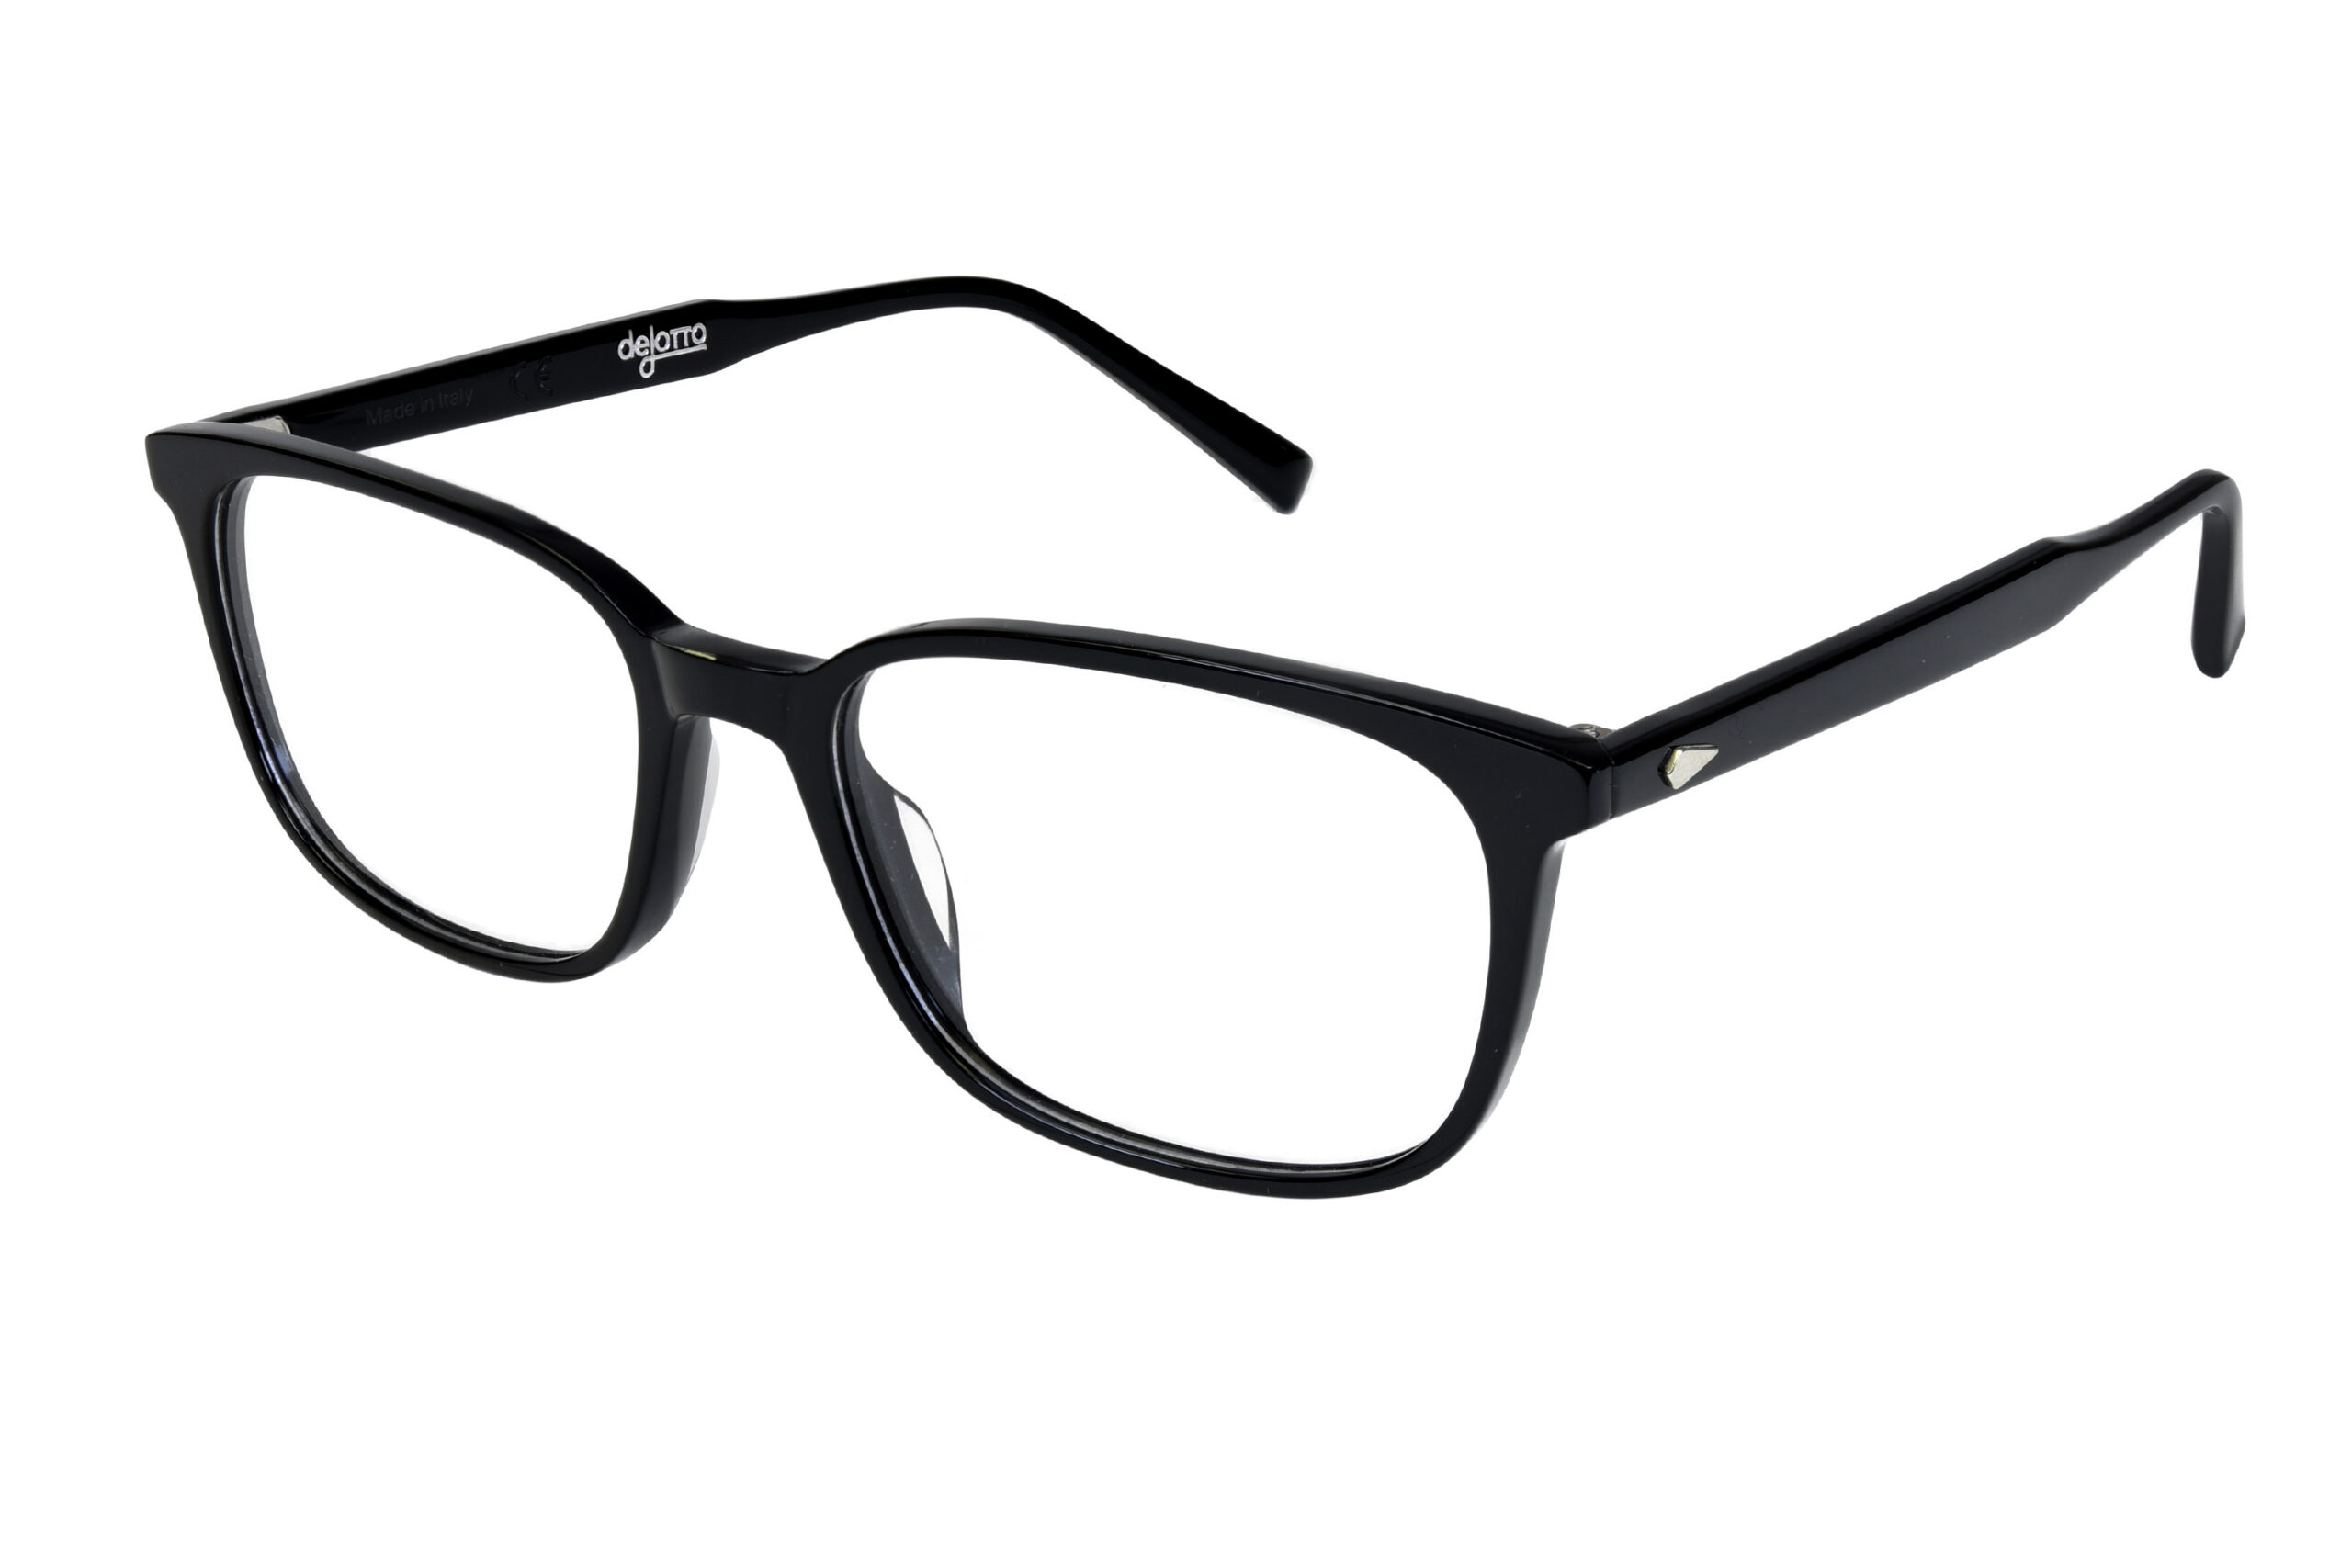 DL 155 c.8001 – Black